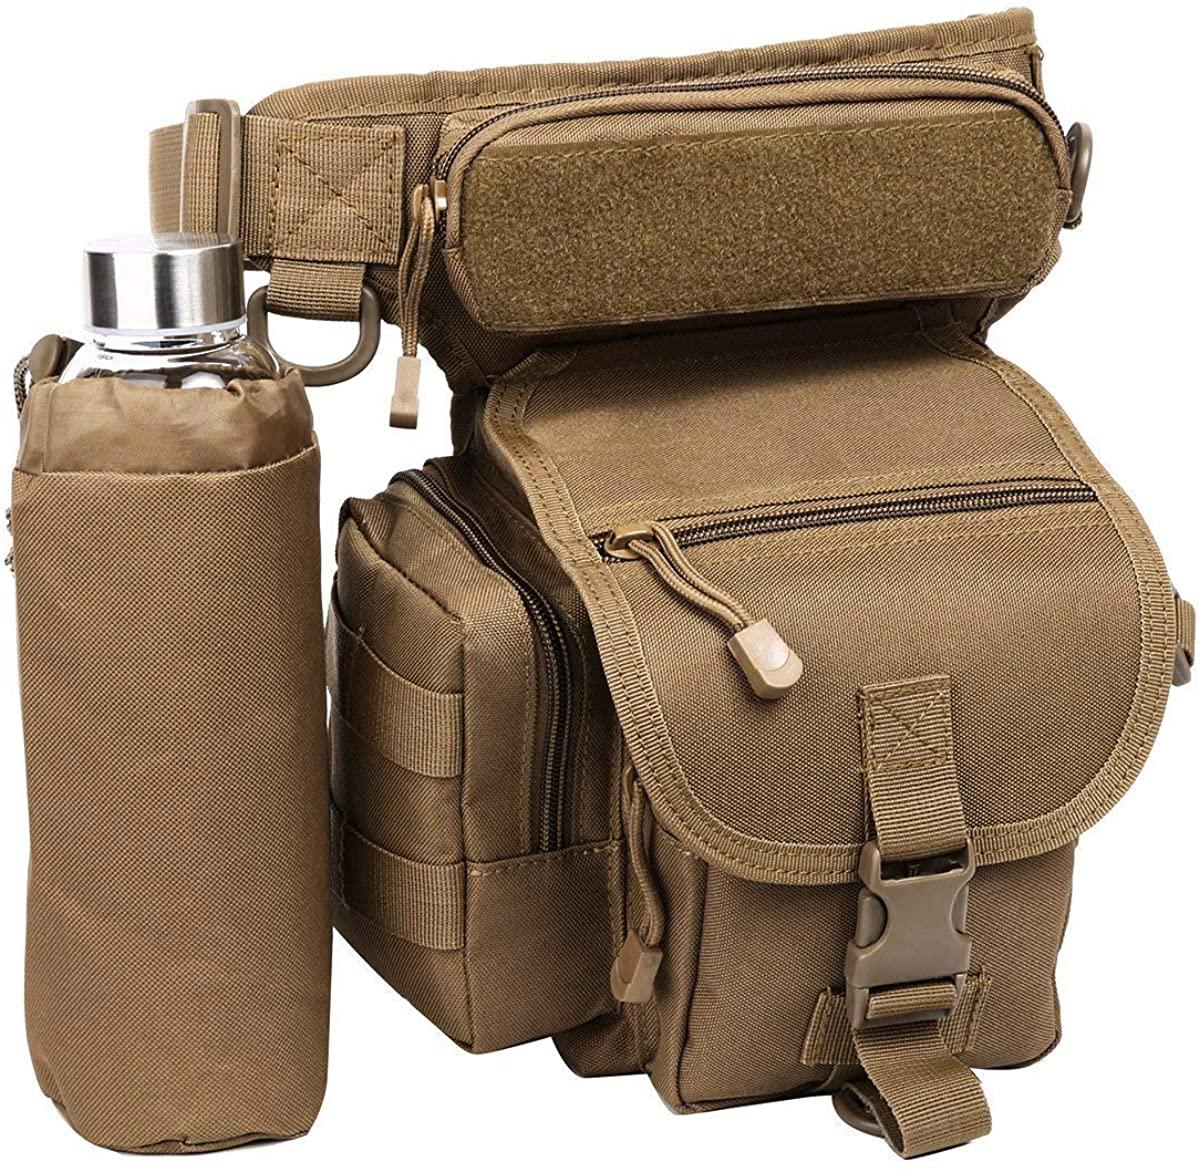 Eshow Men's Drop Leg Pouch Tools Bags Tactical Leg Bag Fanny Pack Thigh Bags Bike Cycling Hip Bag Canvas Waist Packs (Brown205)